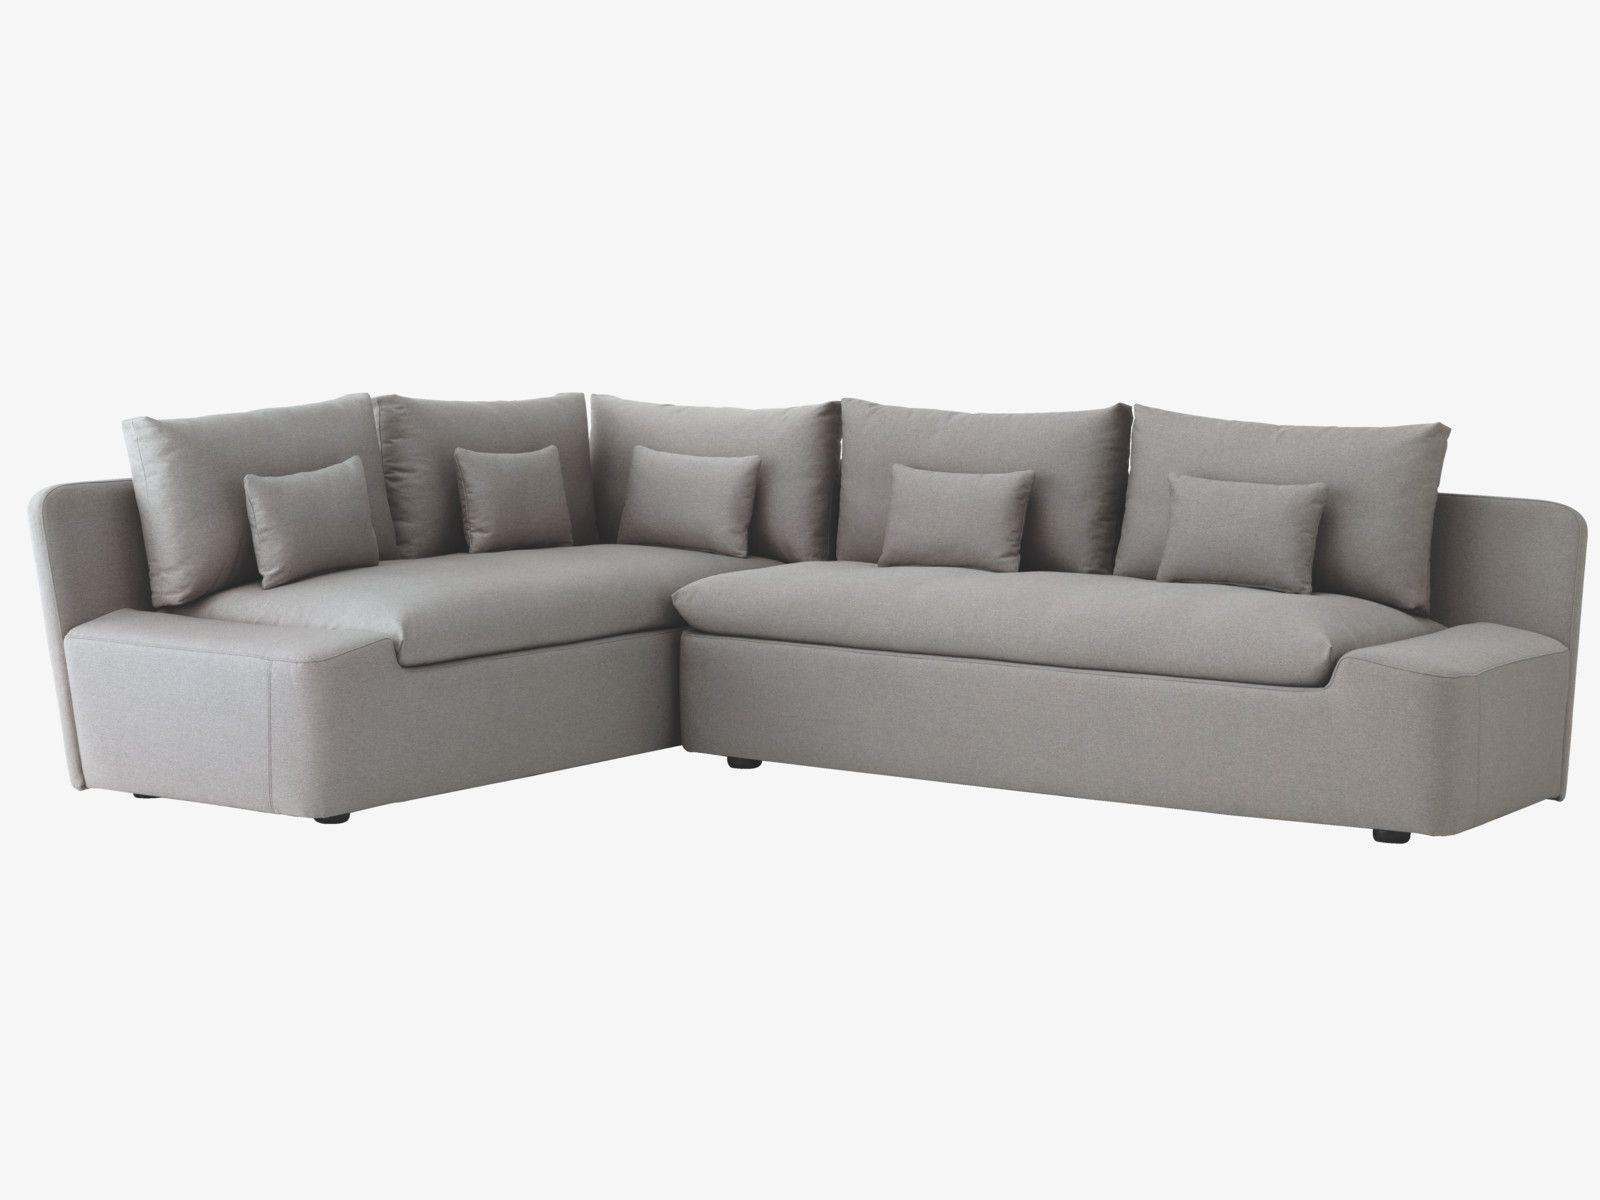 Kasha Grey Fabric Right Arm Corner Sofa Contemporary Couches Corner Sofa Upholstered Sofa